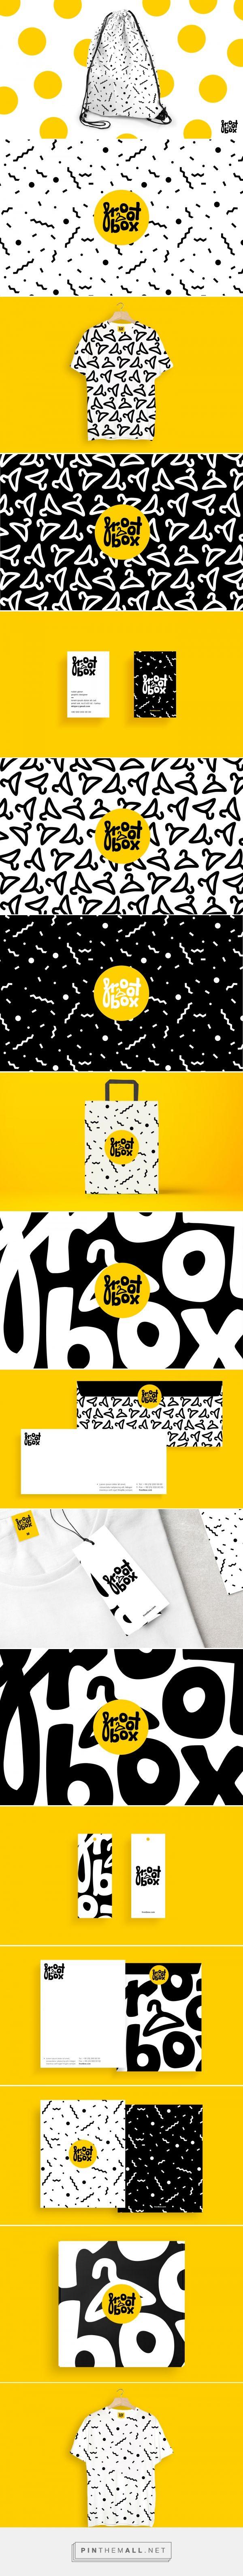 Frootbox Branding by Nuket Guner Corlan | Fivestar Branding – Design and Branding Agency & Inspiration Gallery